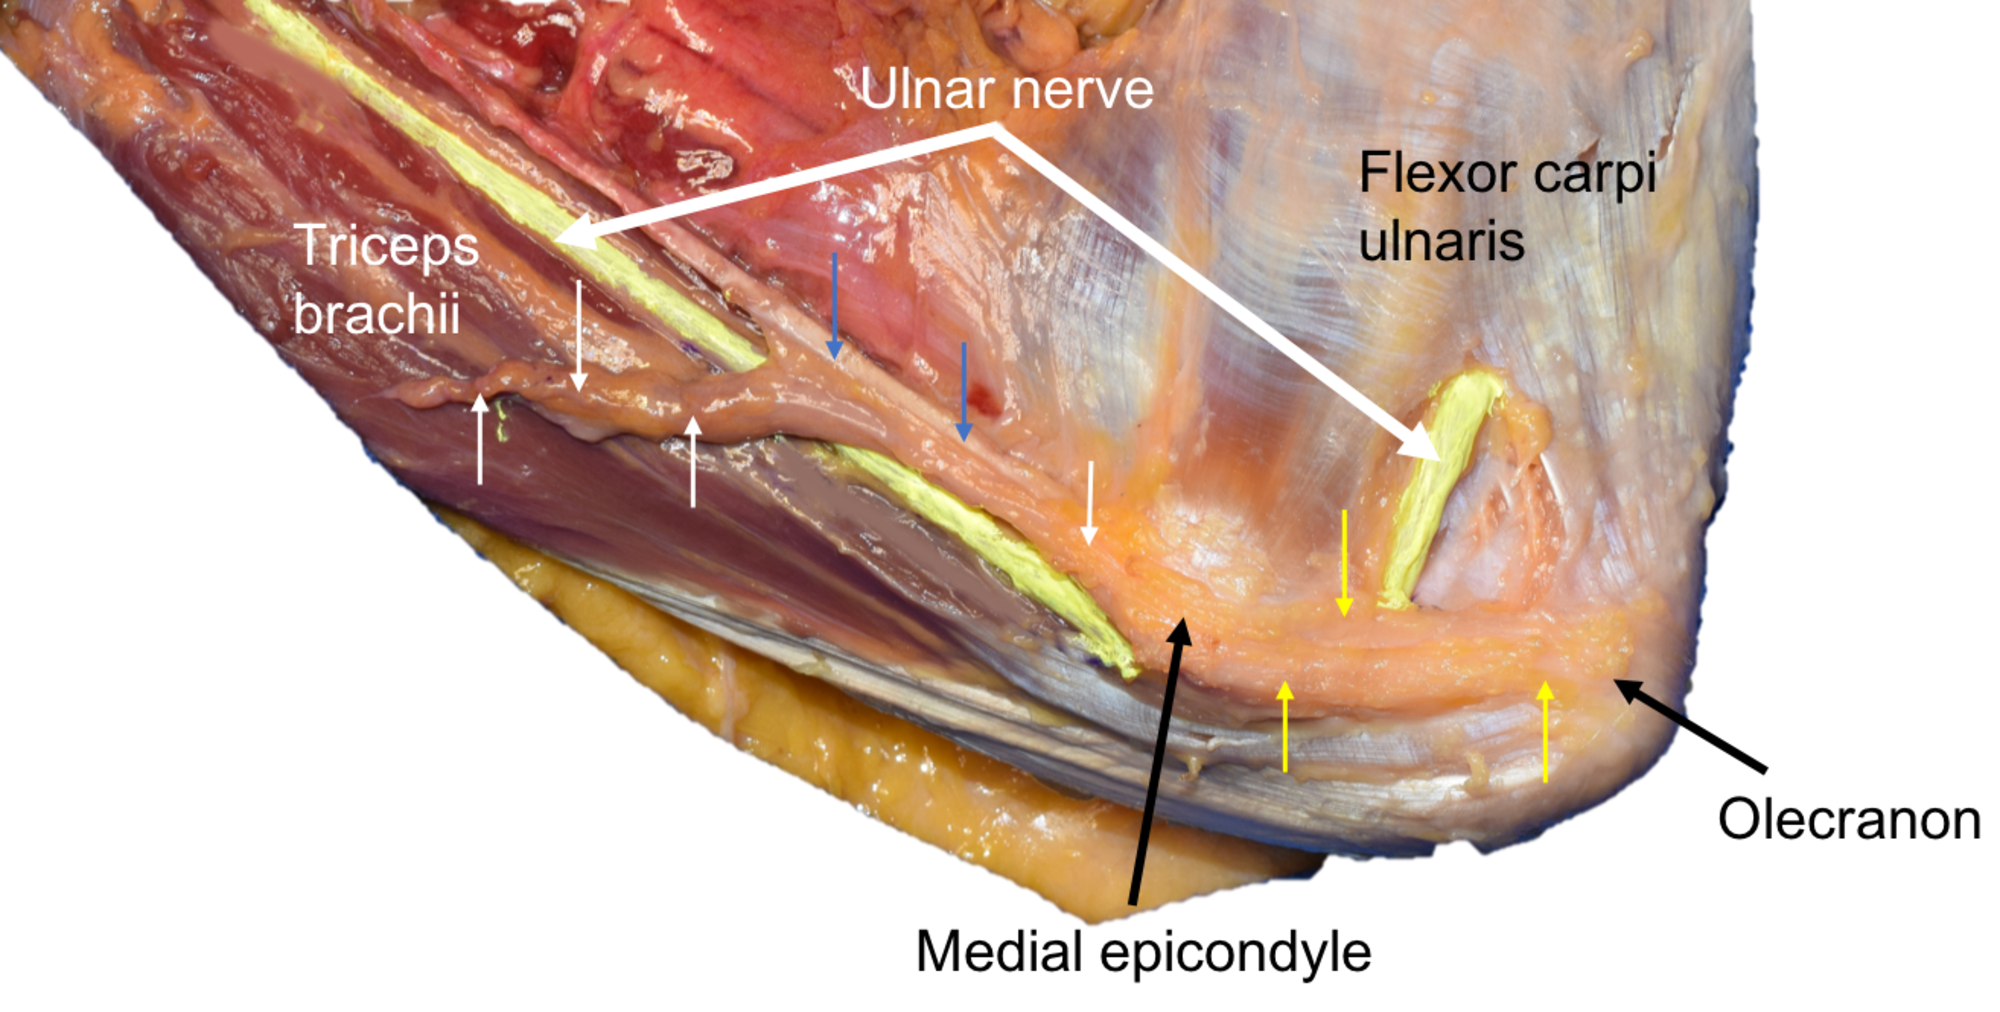 Cureus Variant Of The Anconeus Epitrochlearis Muscle A Case Report